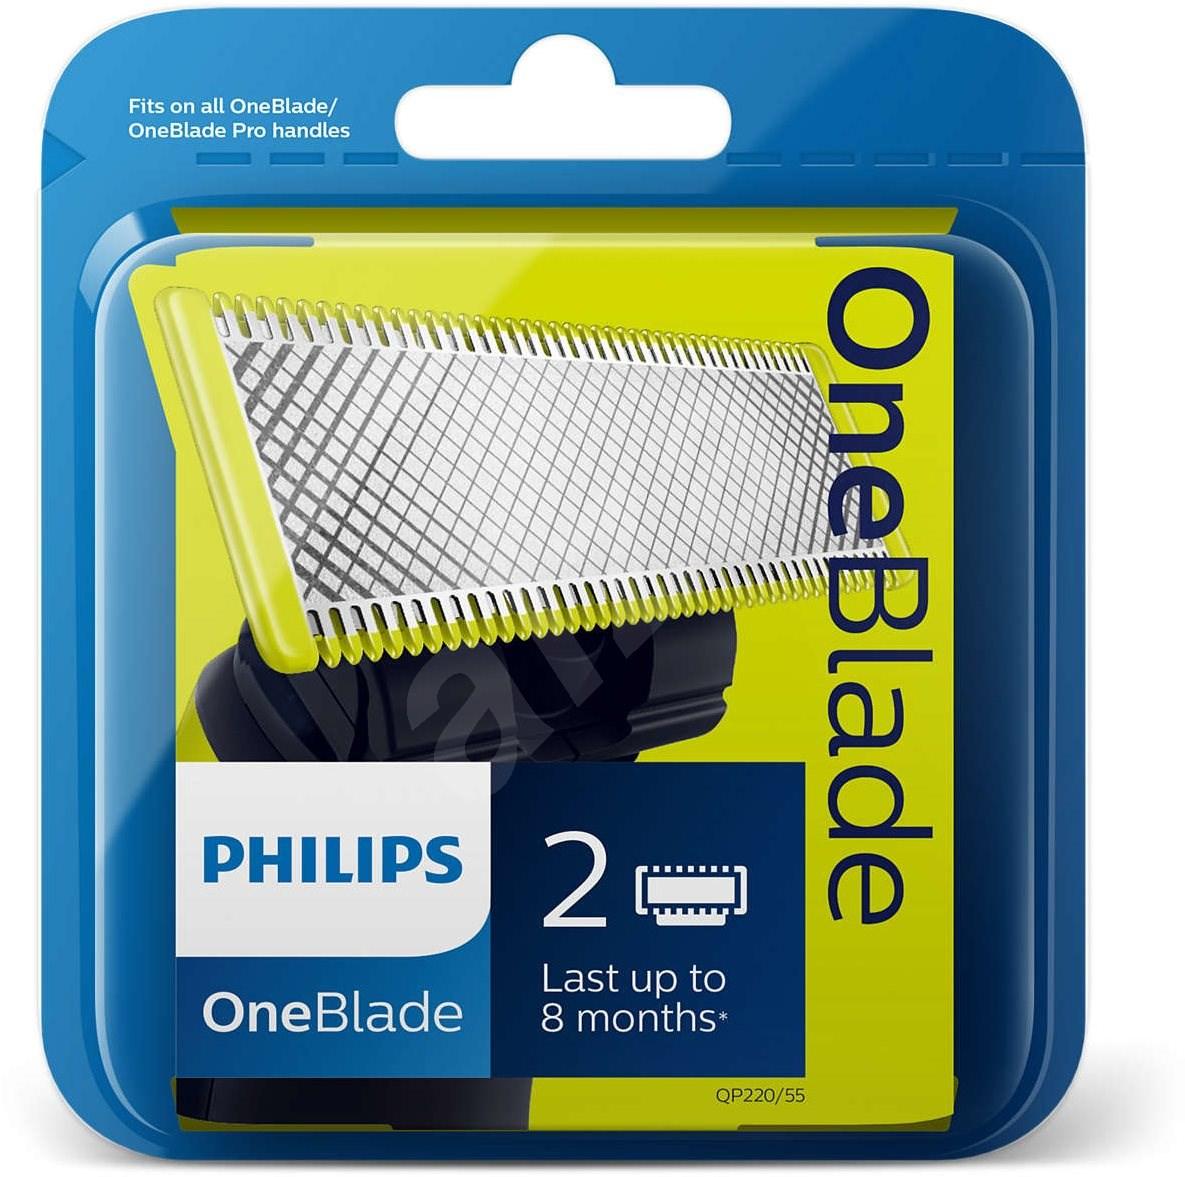 philips oneblade replacement blades 2pcs qp220 55 accessories. Black Bedroom Furniture Sets. Home Design Ideas